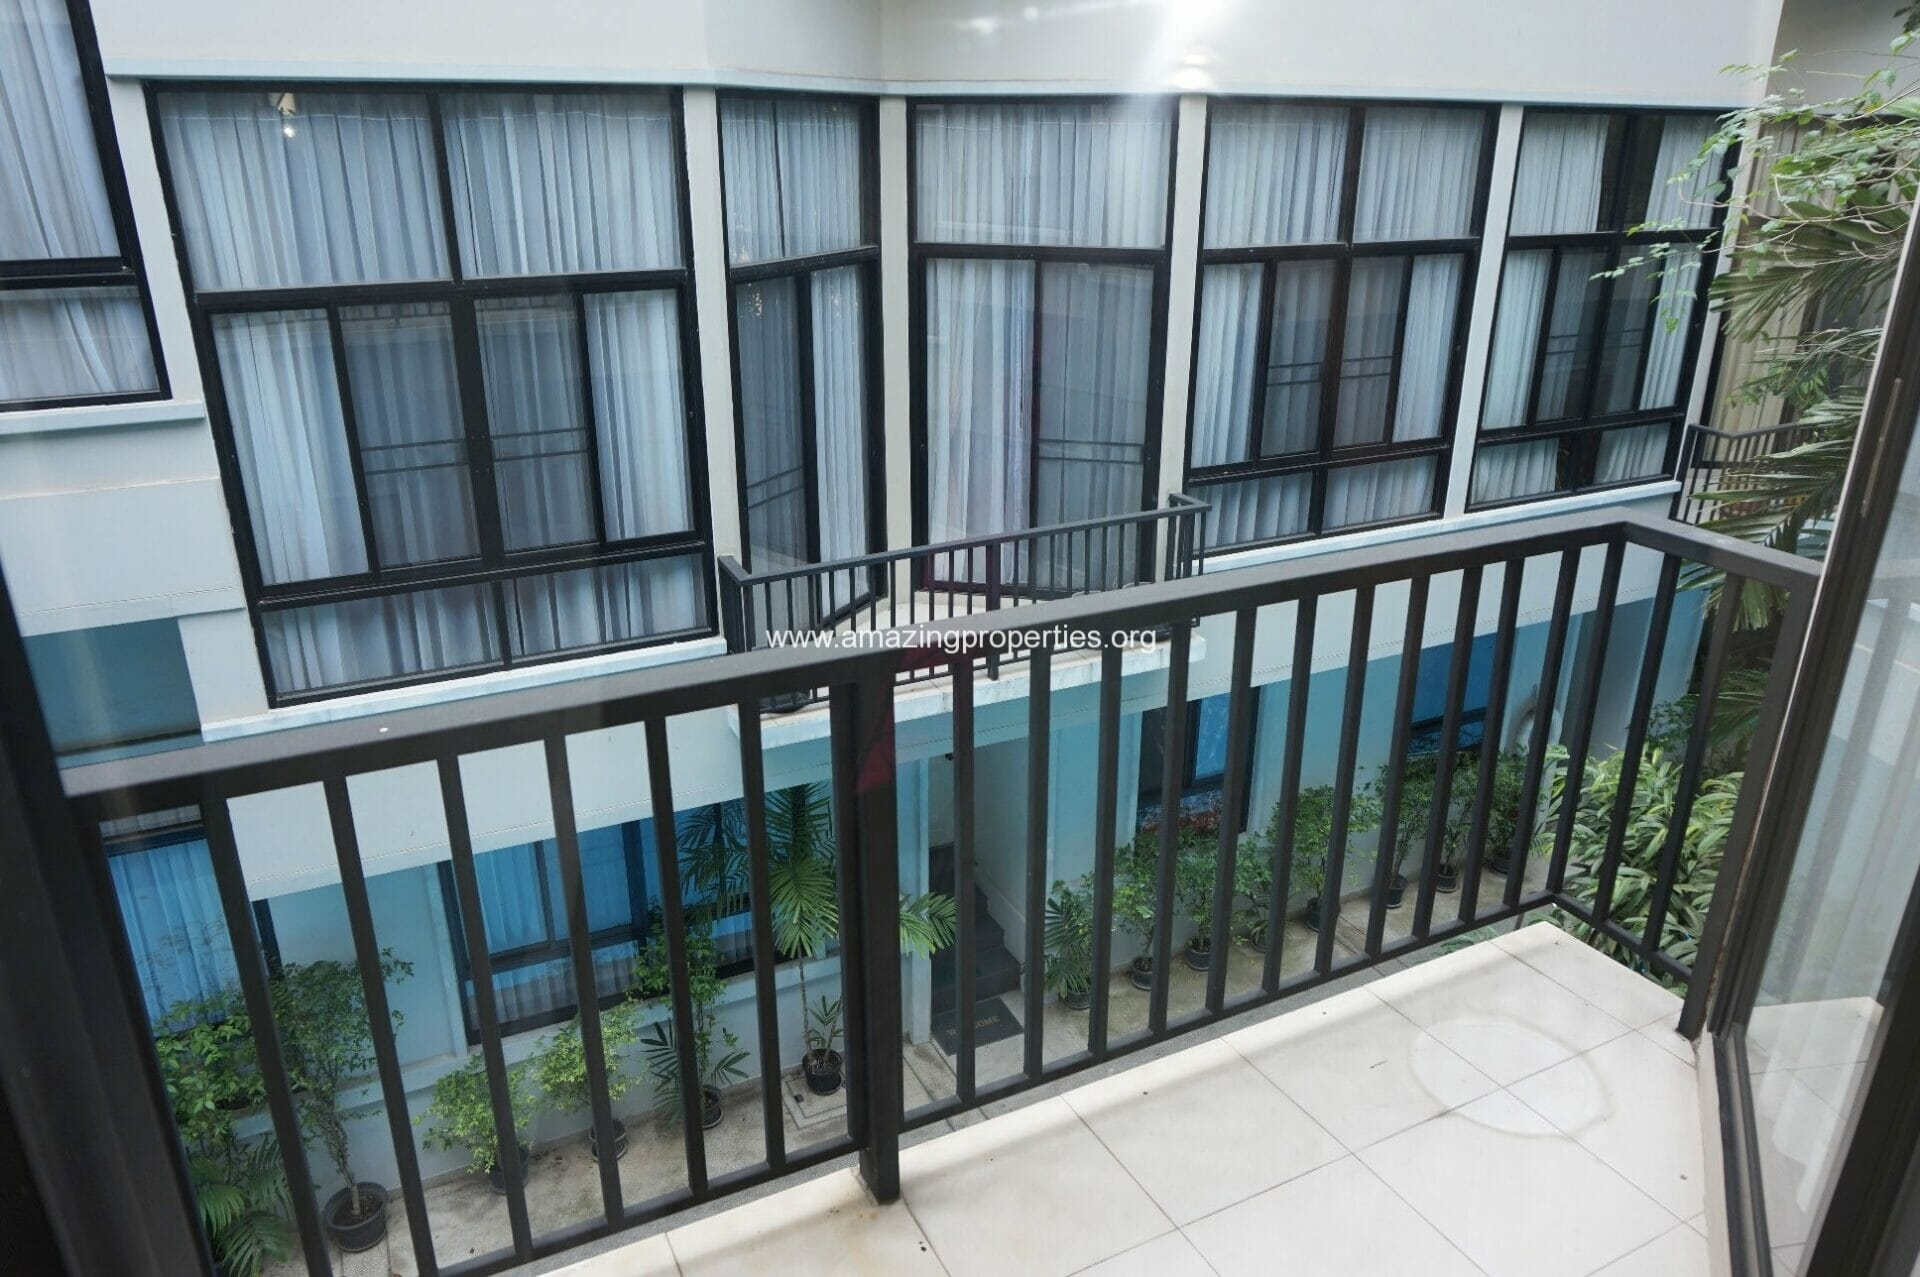 4 bedroom Veranda Ville-12